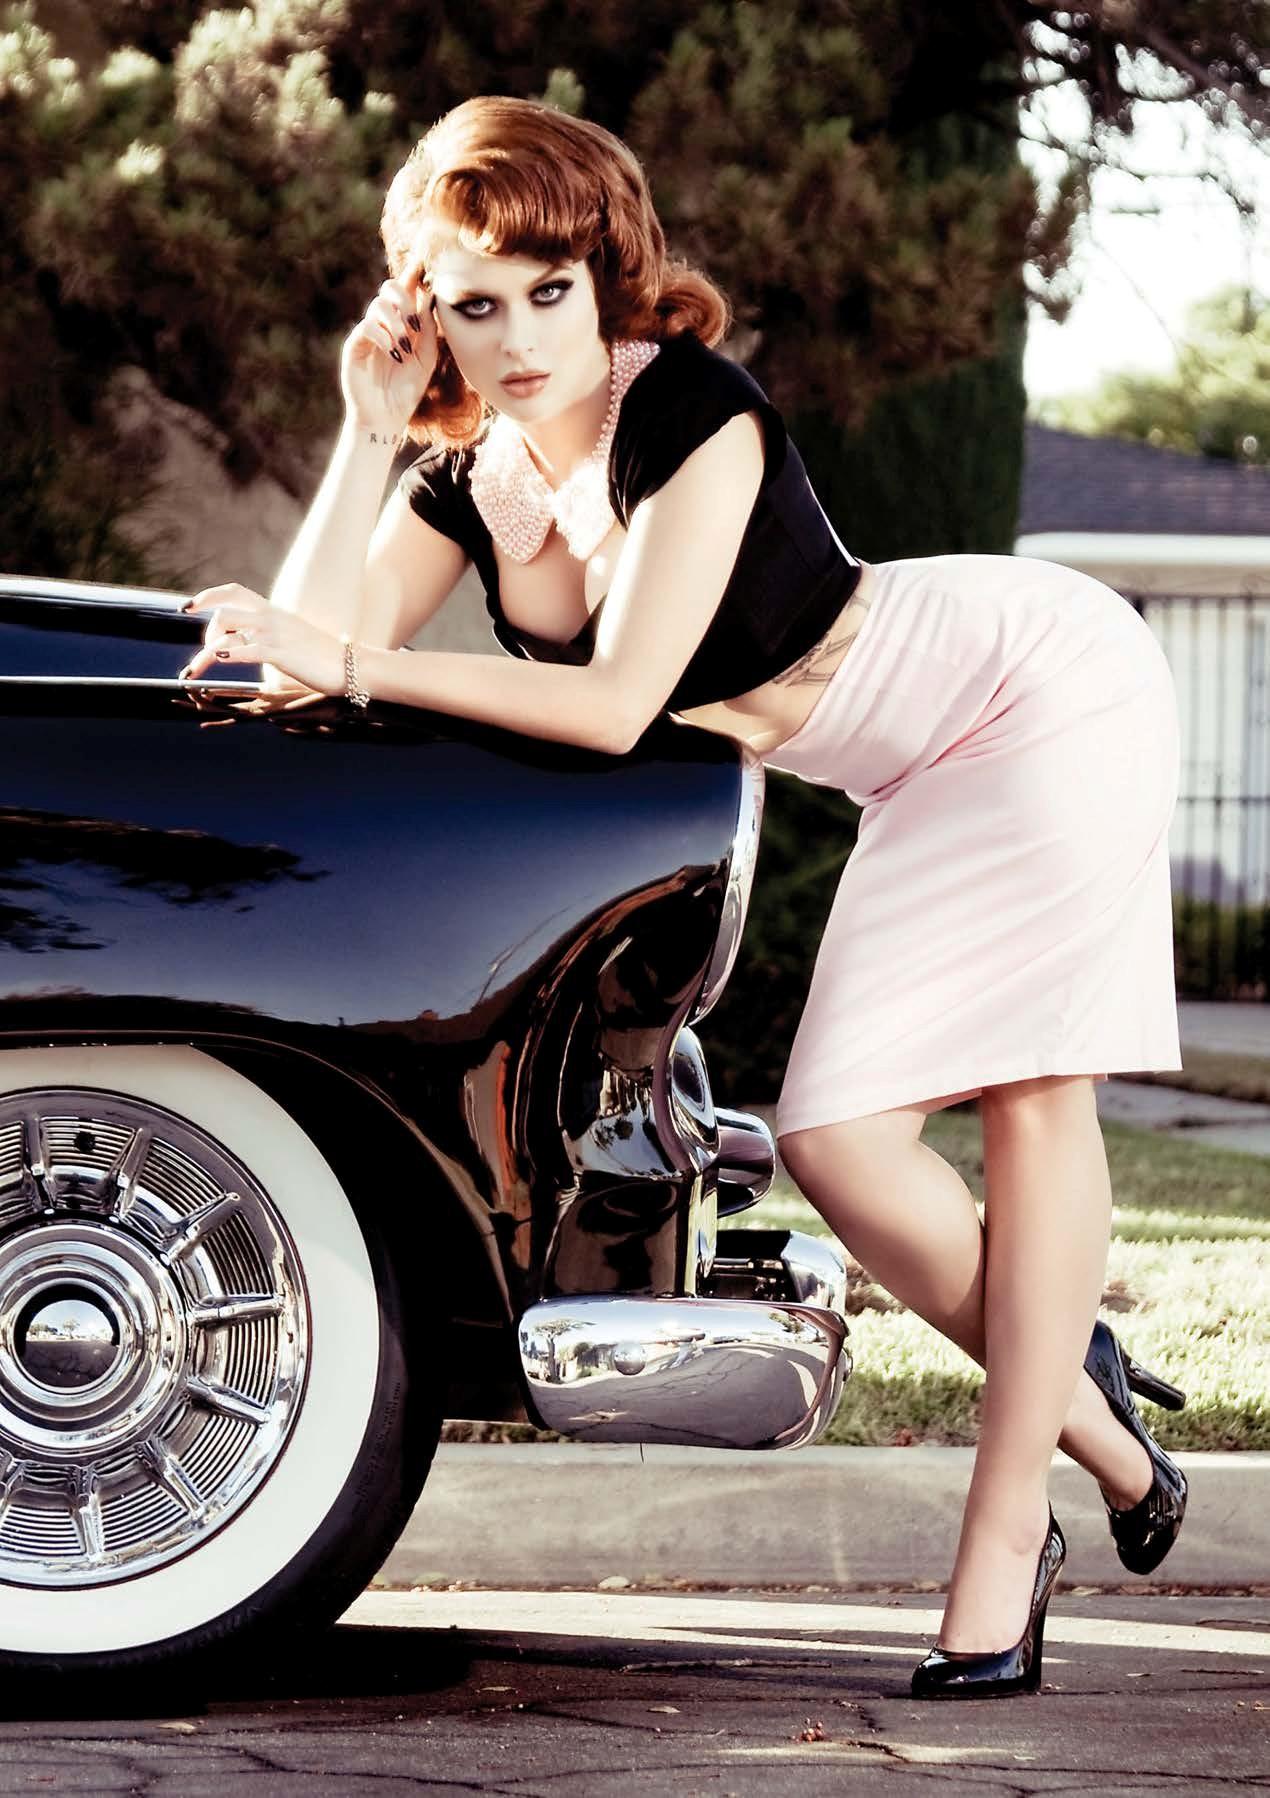 Renee Olstead Is Gangsta-Hot Next to a Chevy Deluxe Styleline [Photyo ...